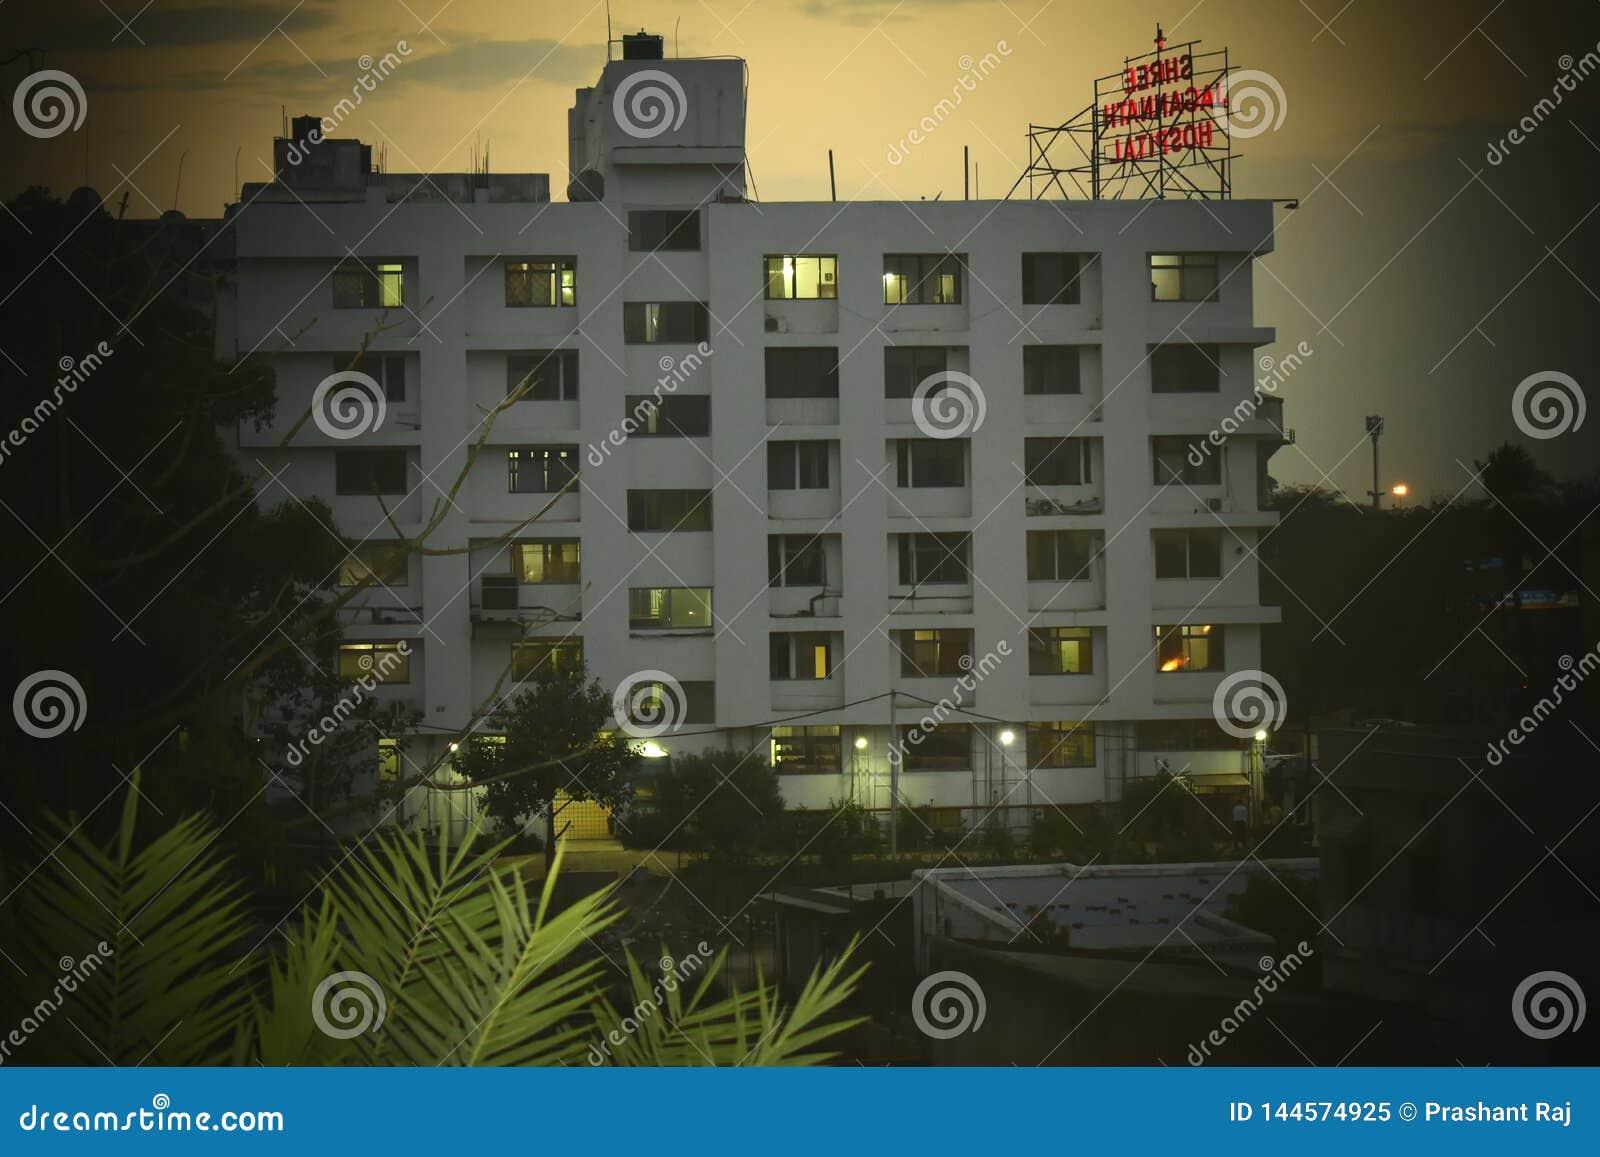 Shree jagarnnath hospital